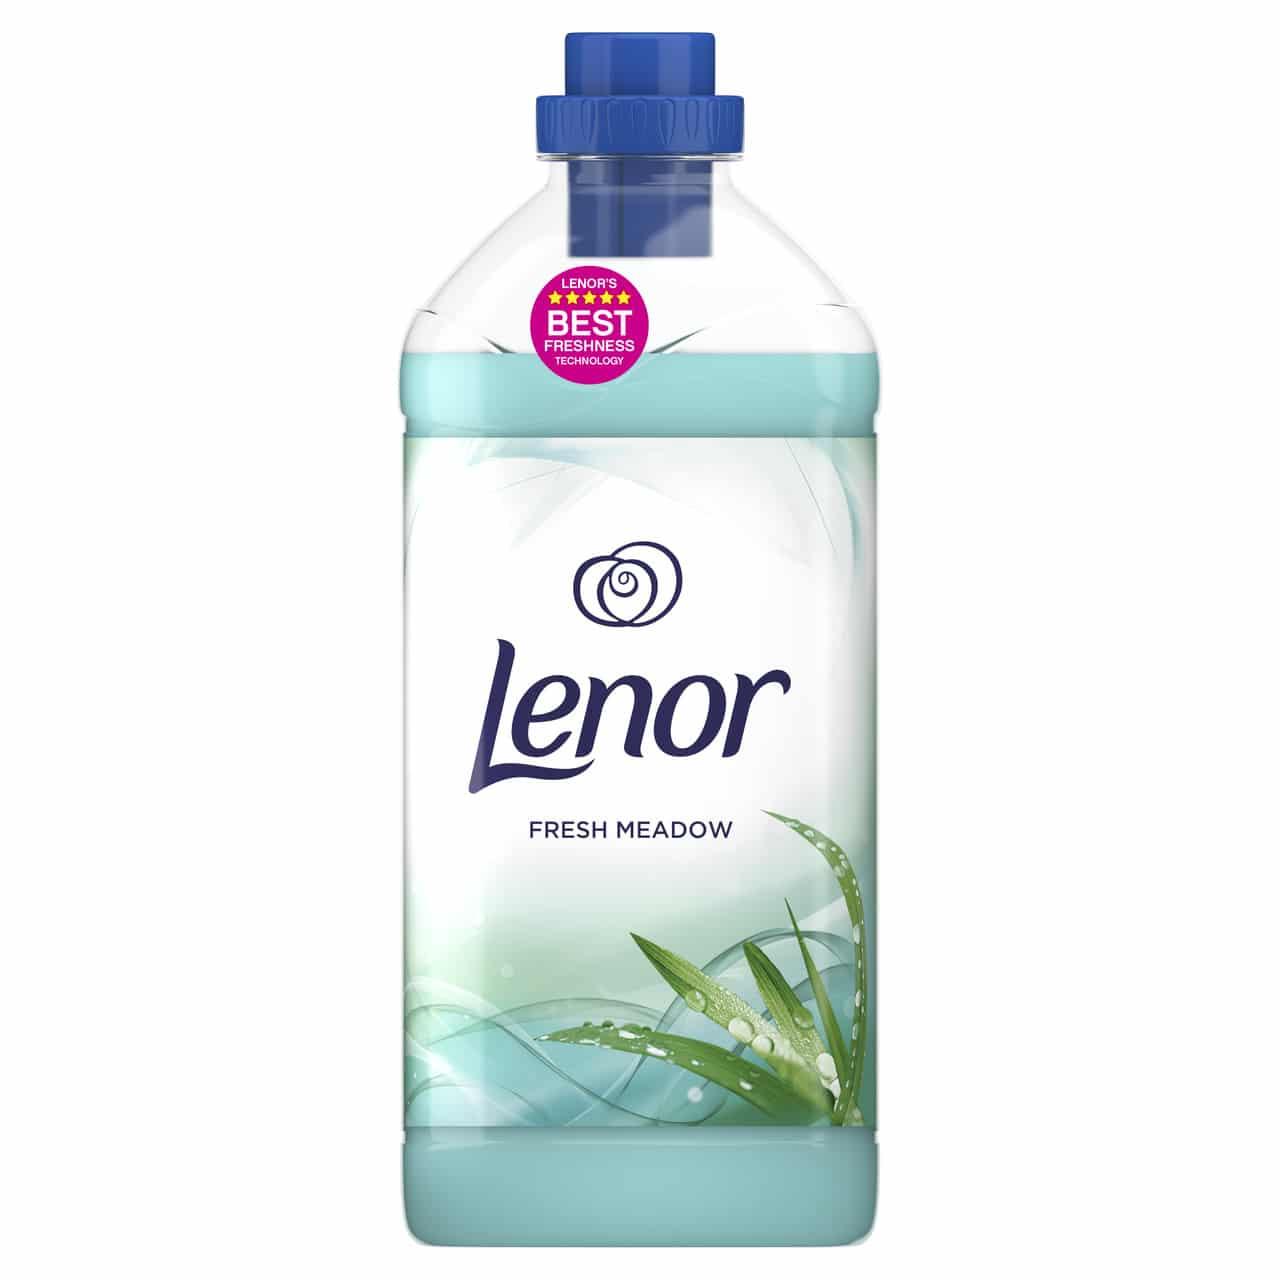 LENOR ULTRA FRESH MEADOW, 72 WASHES, 1.8ML